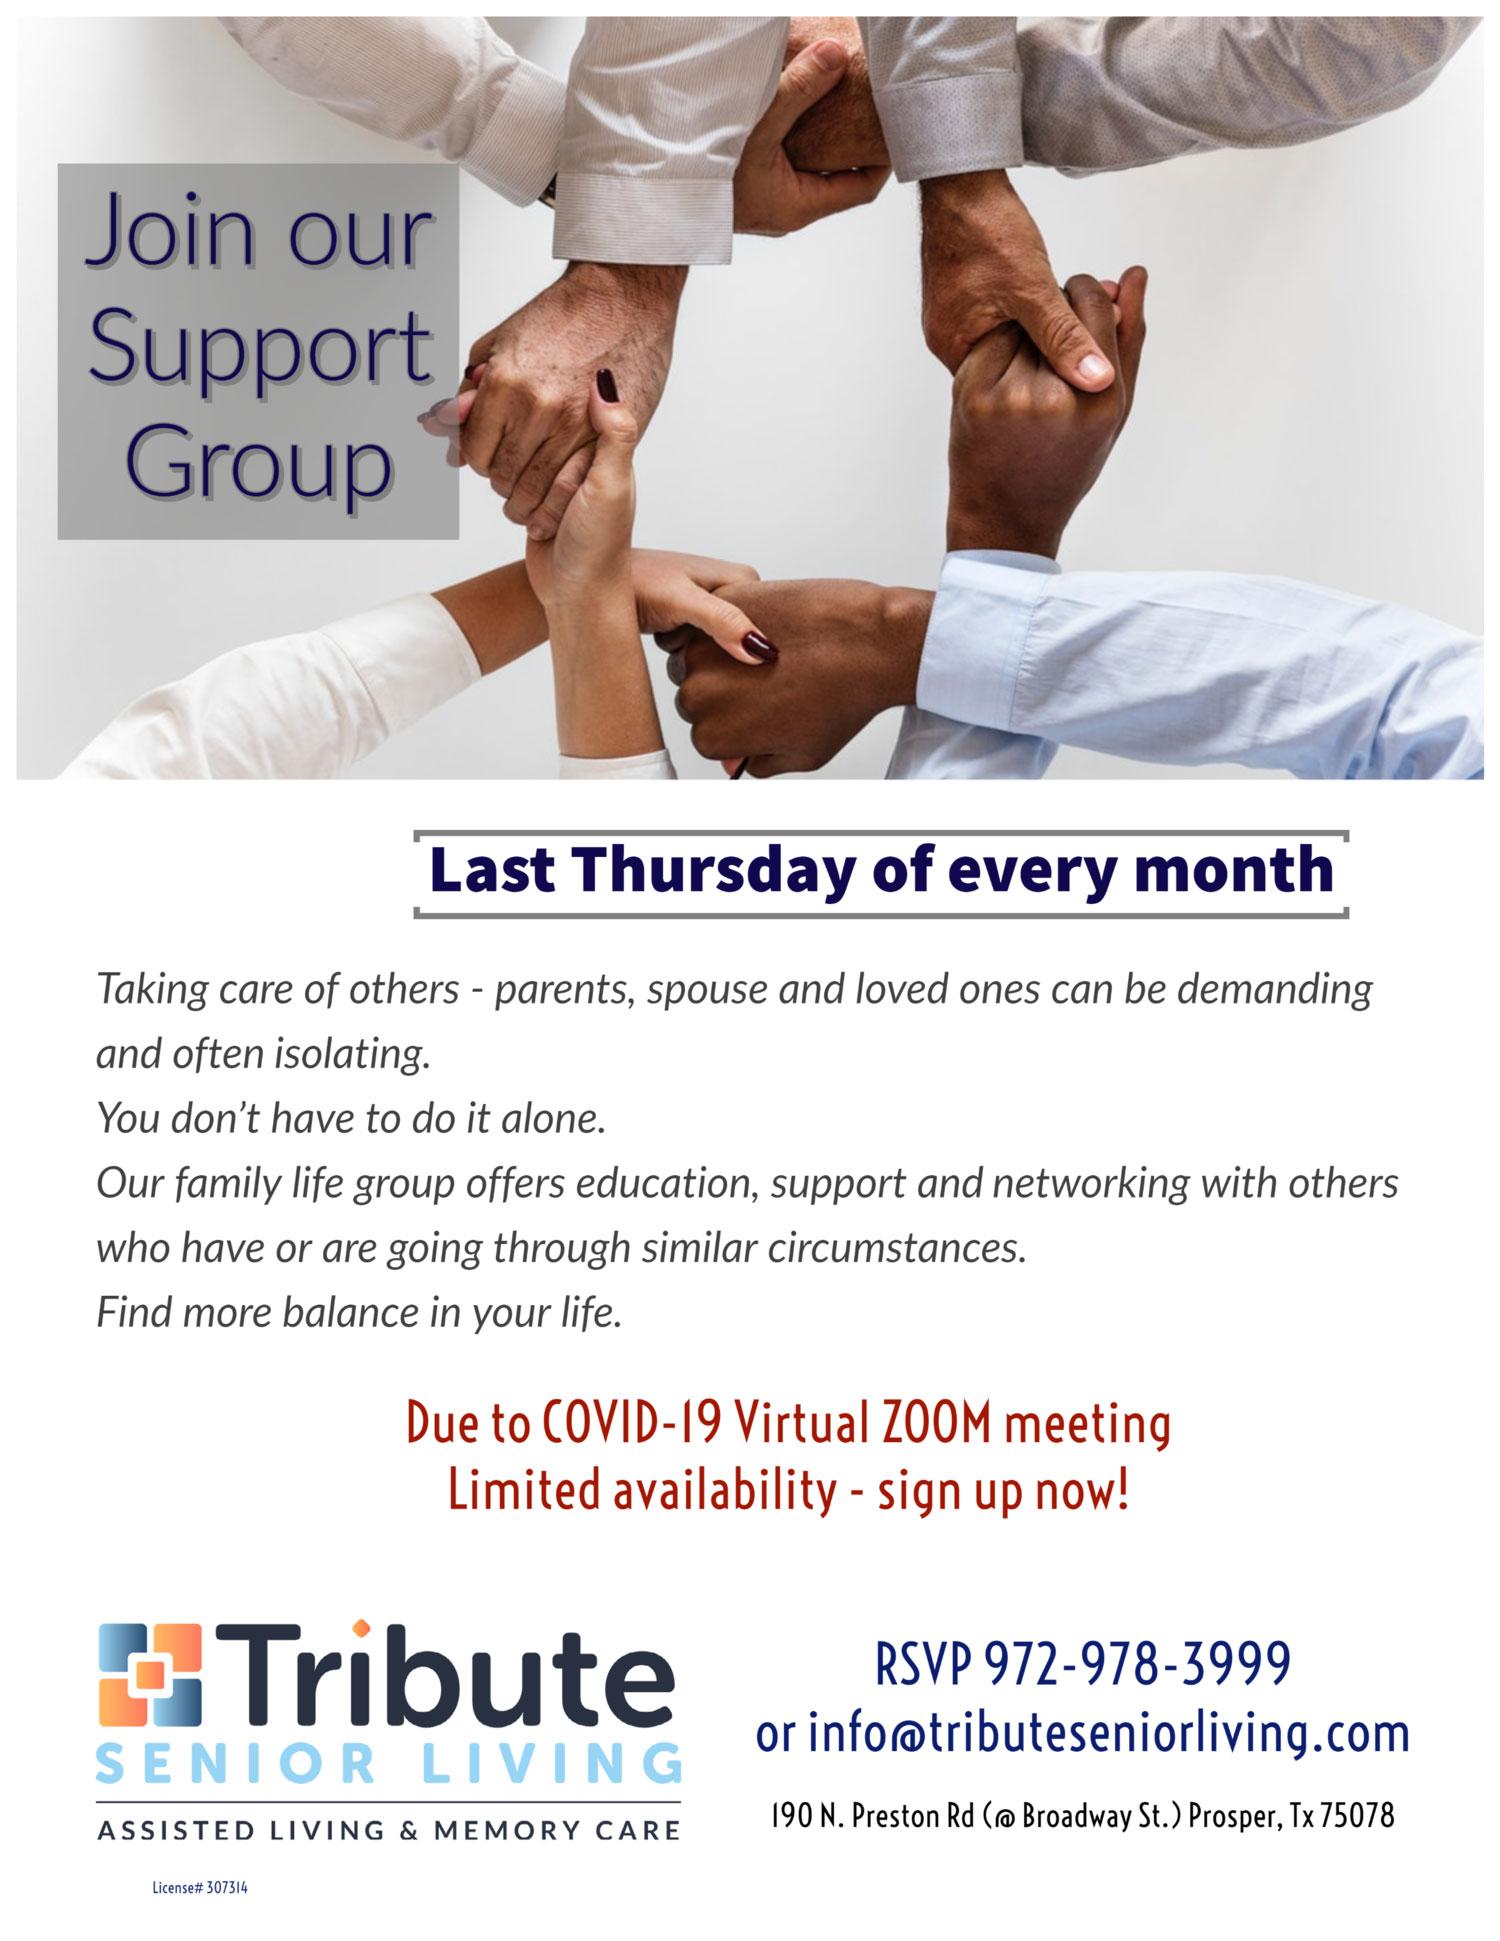 supportgroupflyercopy2 1